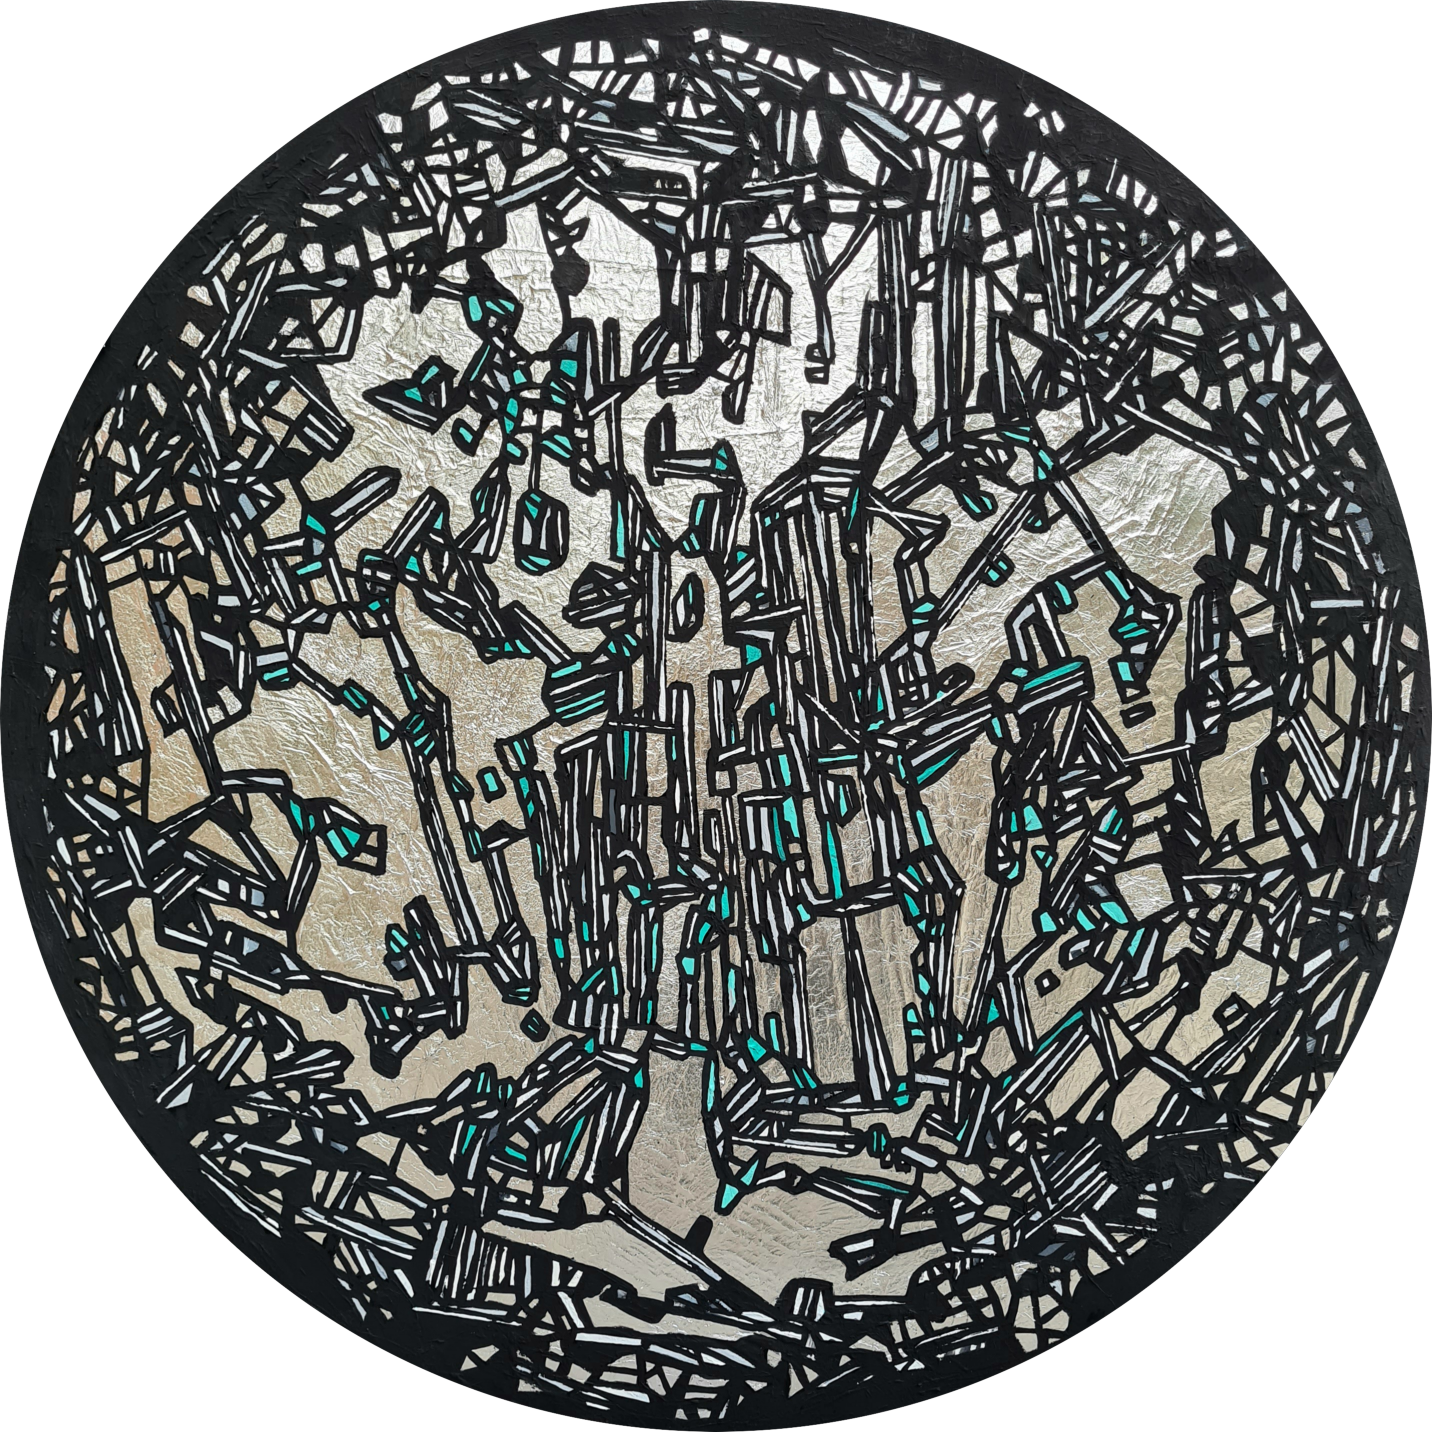 Tectonicus II<br></br>Size: 36(Diameter)<br></br>Medium: Silver-leaf & Acrylic on Canvas